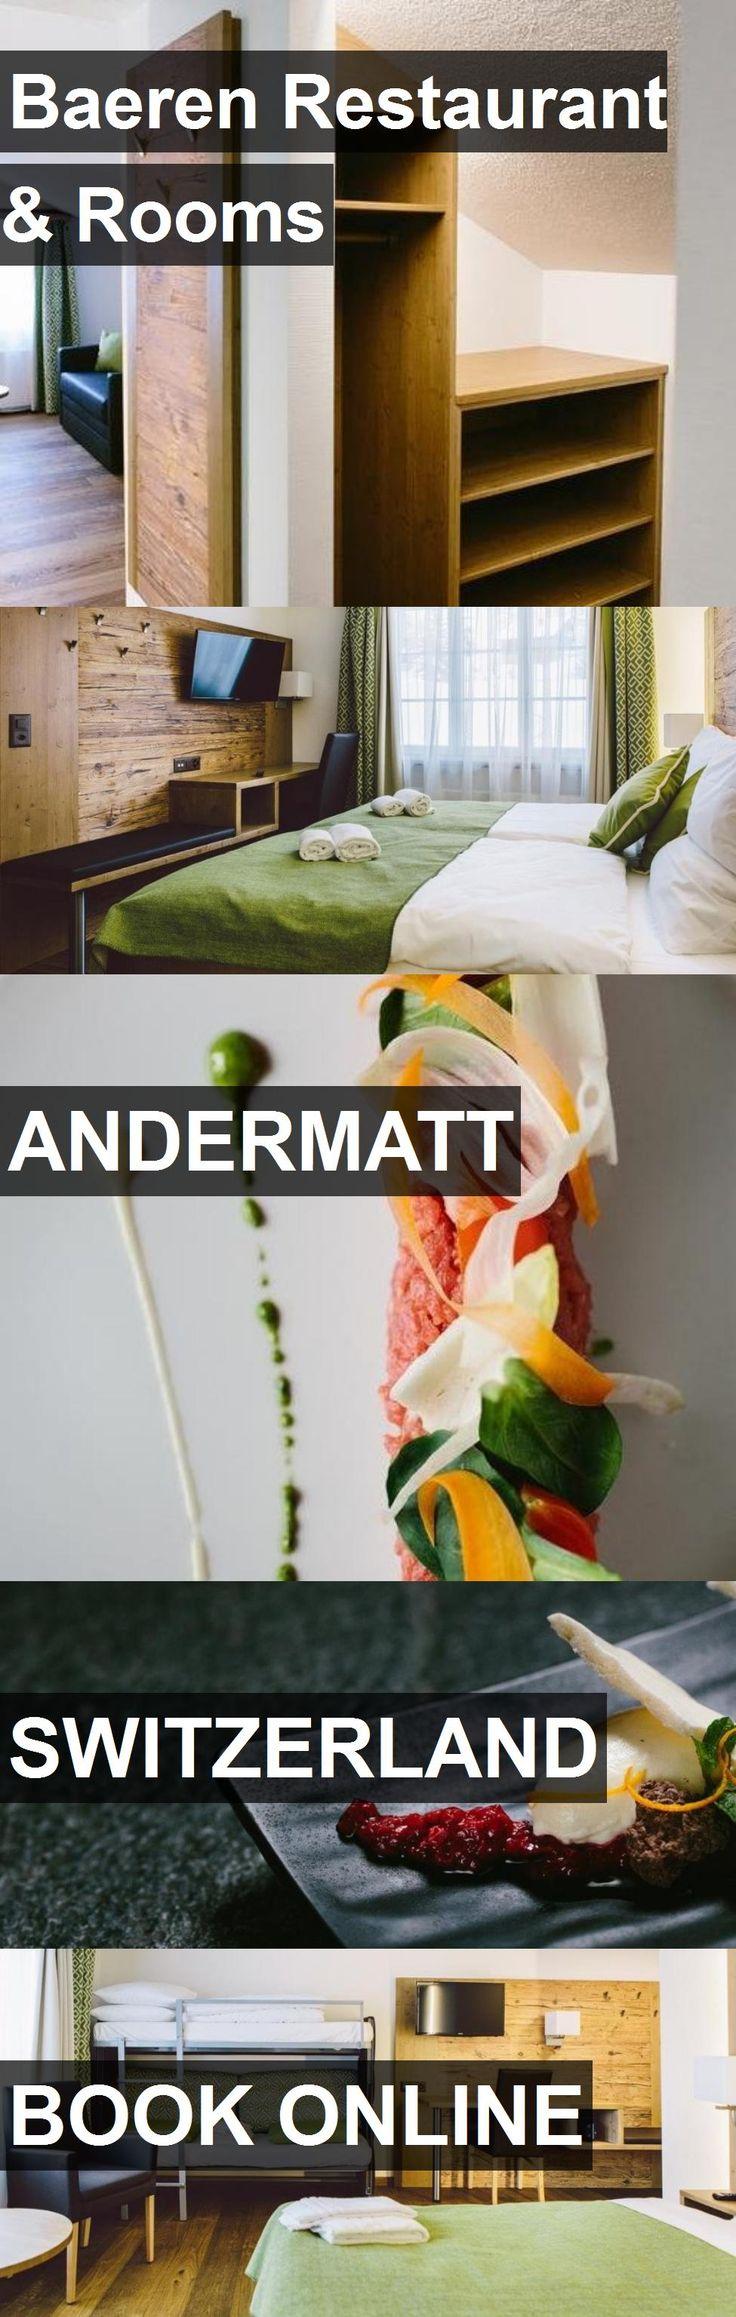 Hotel Baeren Restaurant